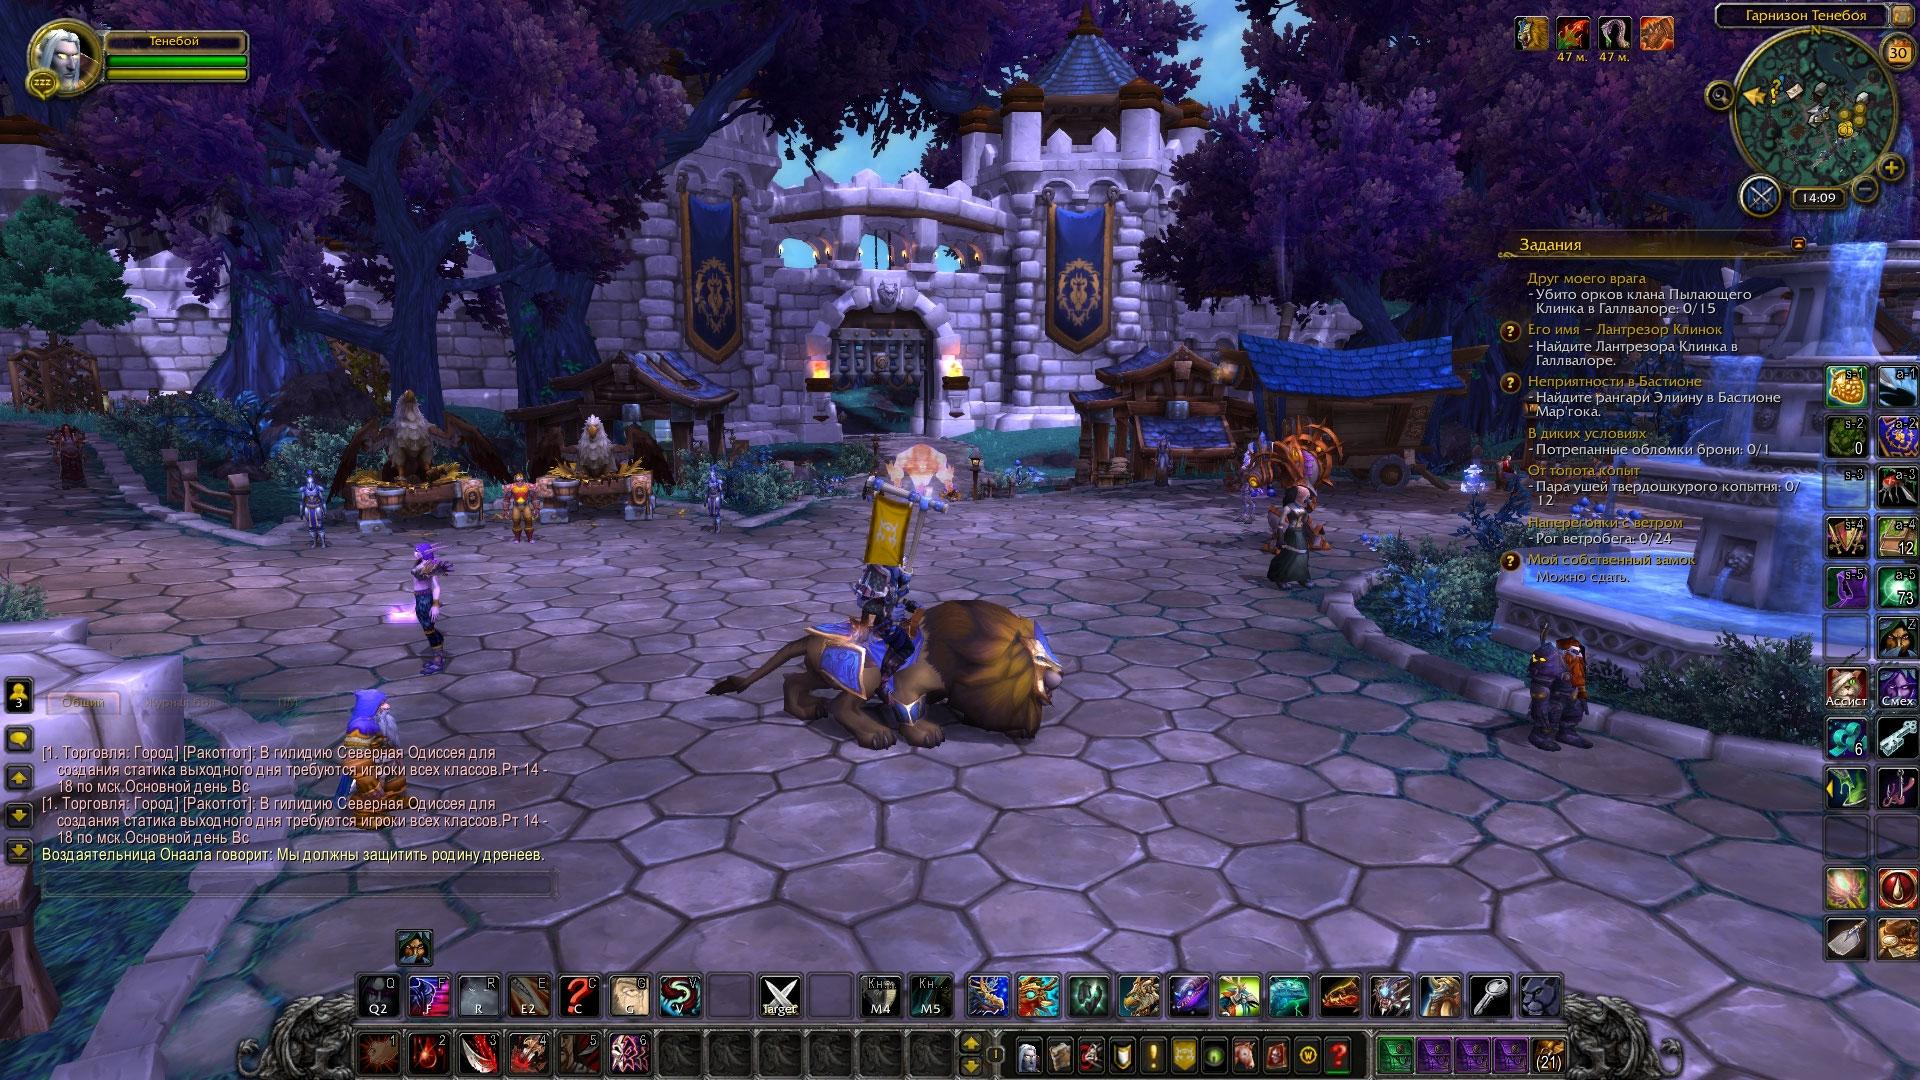 The Warcraft 3 nude mod nude busty hoe